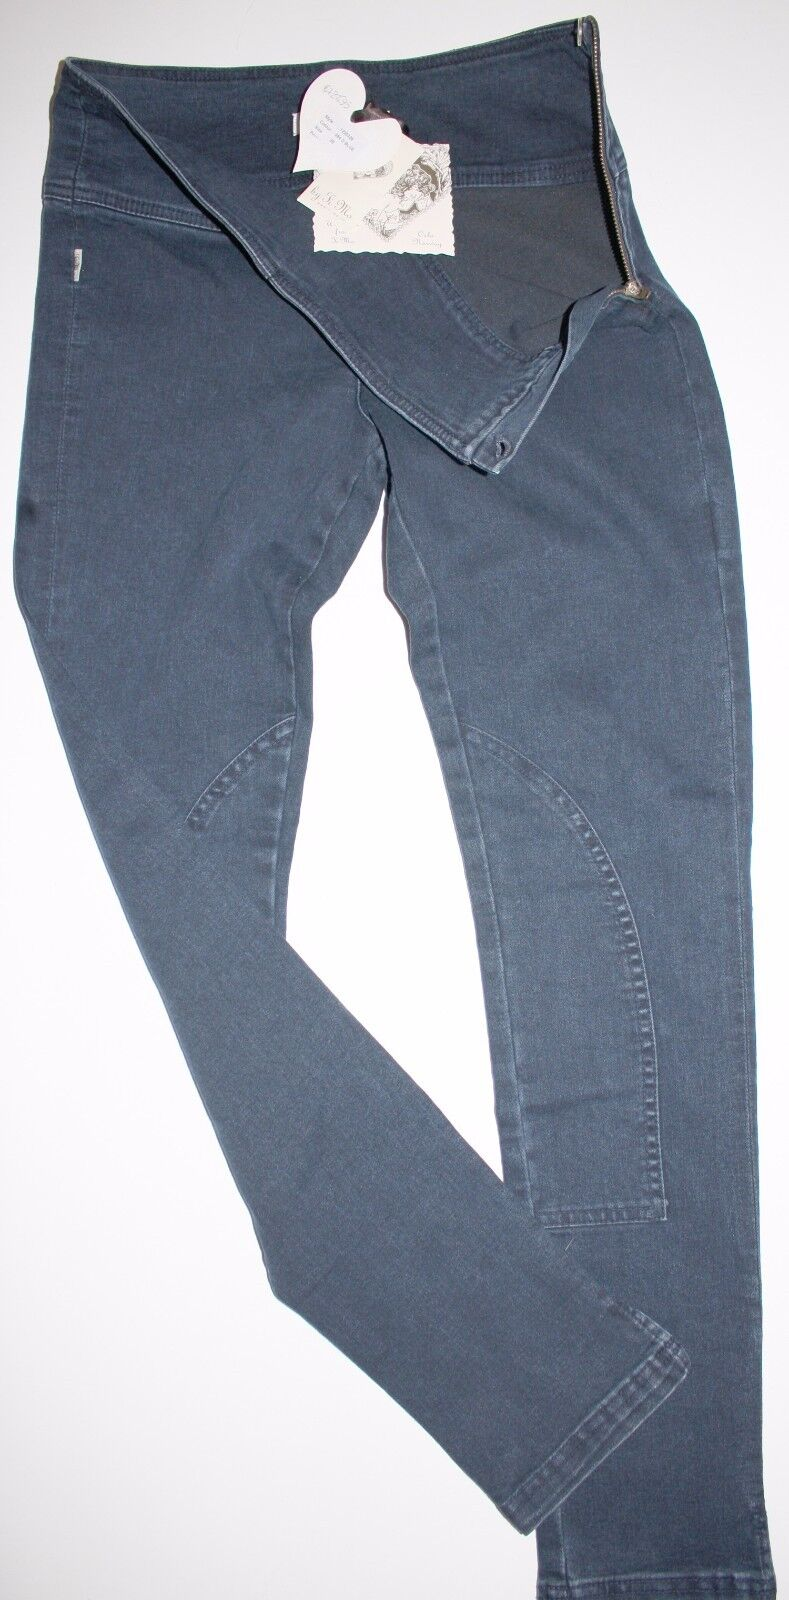 By Ti Mo Leggings Leggings Jeggings Jeans Stretch Skiny bluee  Size  29  Neu